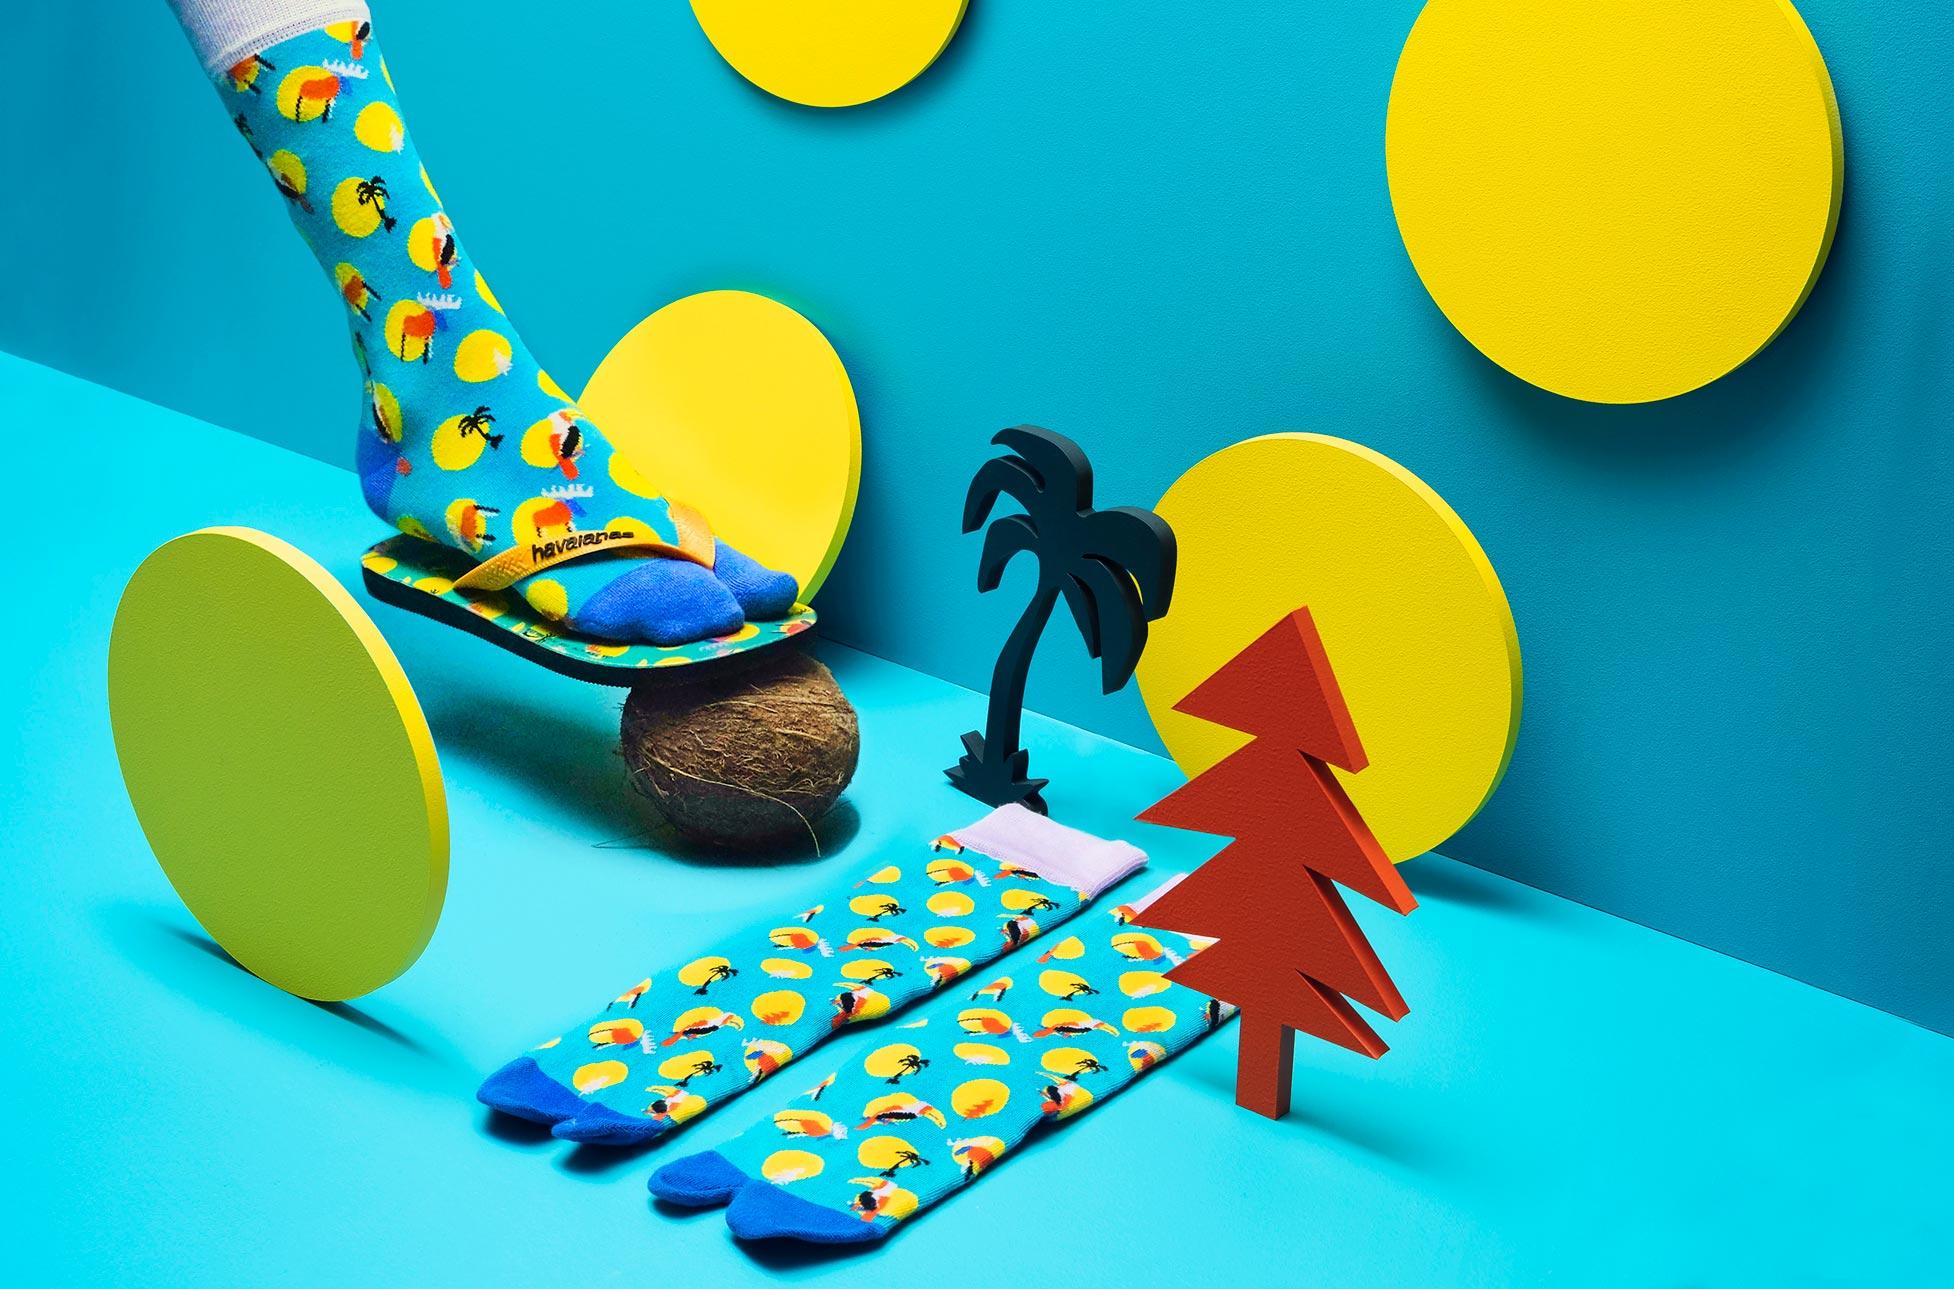 havaianas x happy socks - art direction danyel mejia / photography magnus torsne